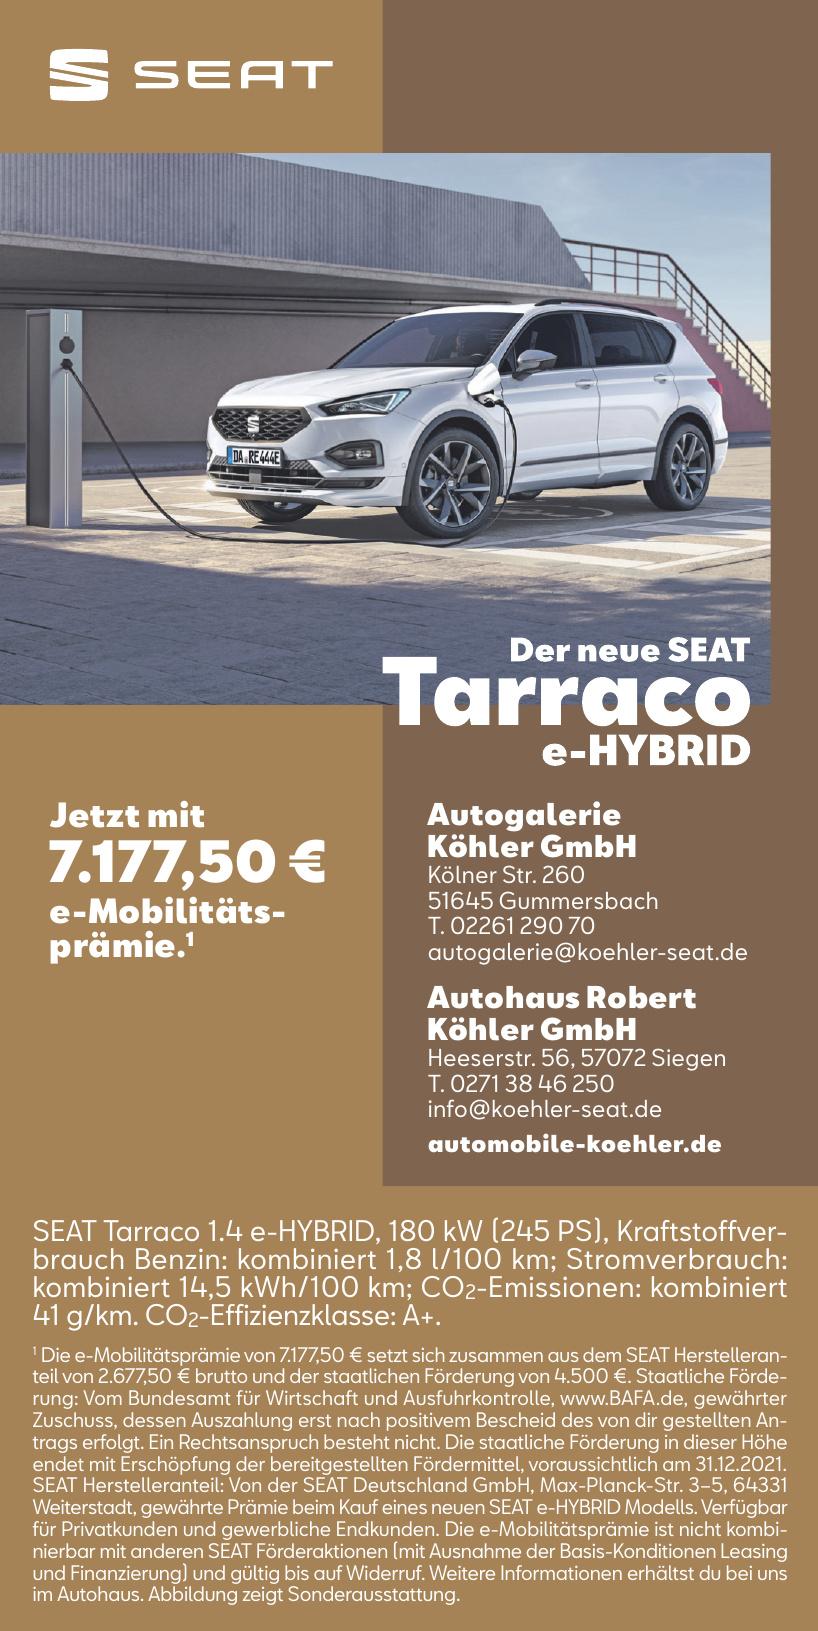 Autogalerie Köhler GmbH